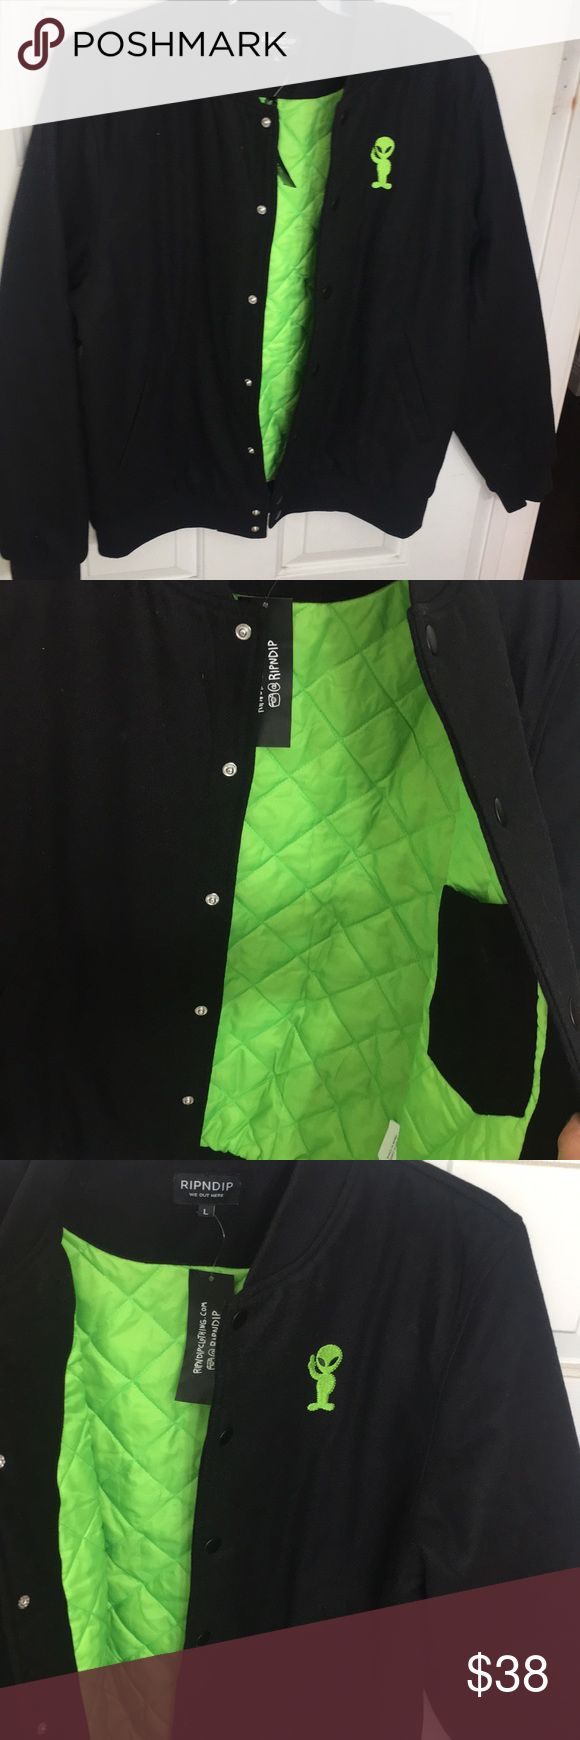 Rip n Dip Jacket BLACK AND GREEN RIP N DIP ALIEN JACKET....Super warm for those cold days.. RIP N DIP Jackets & Coats Bomber & Varsity